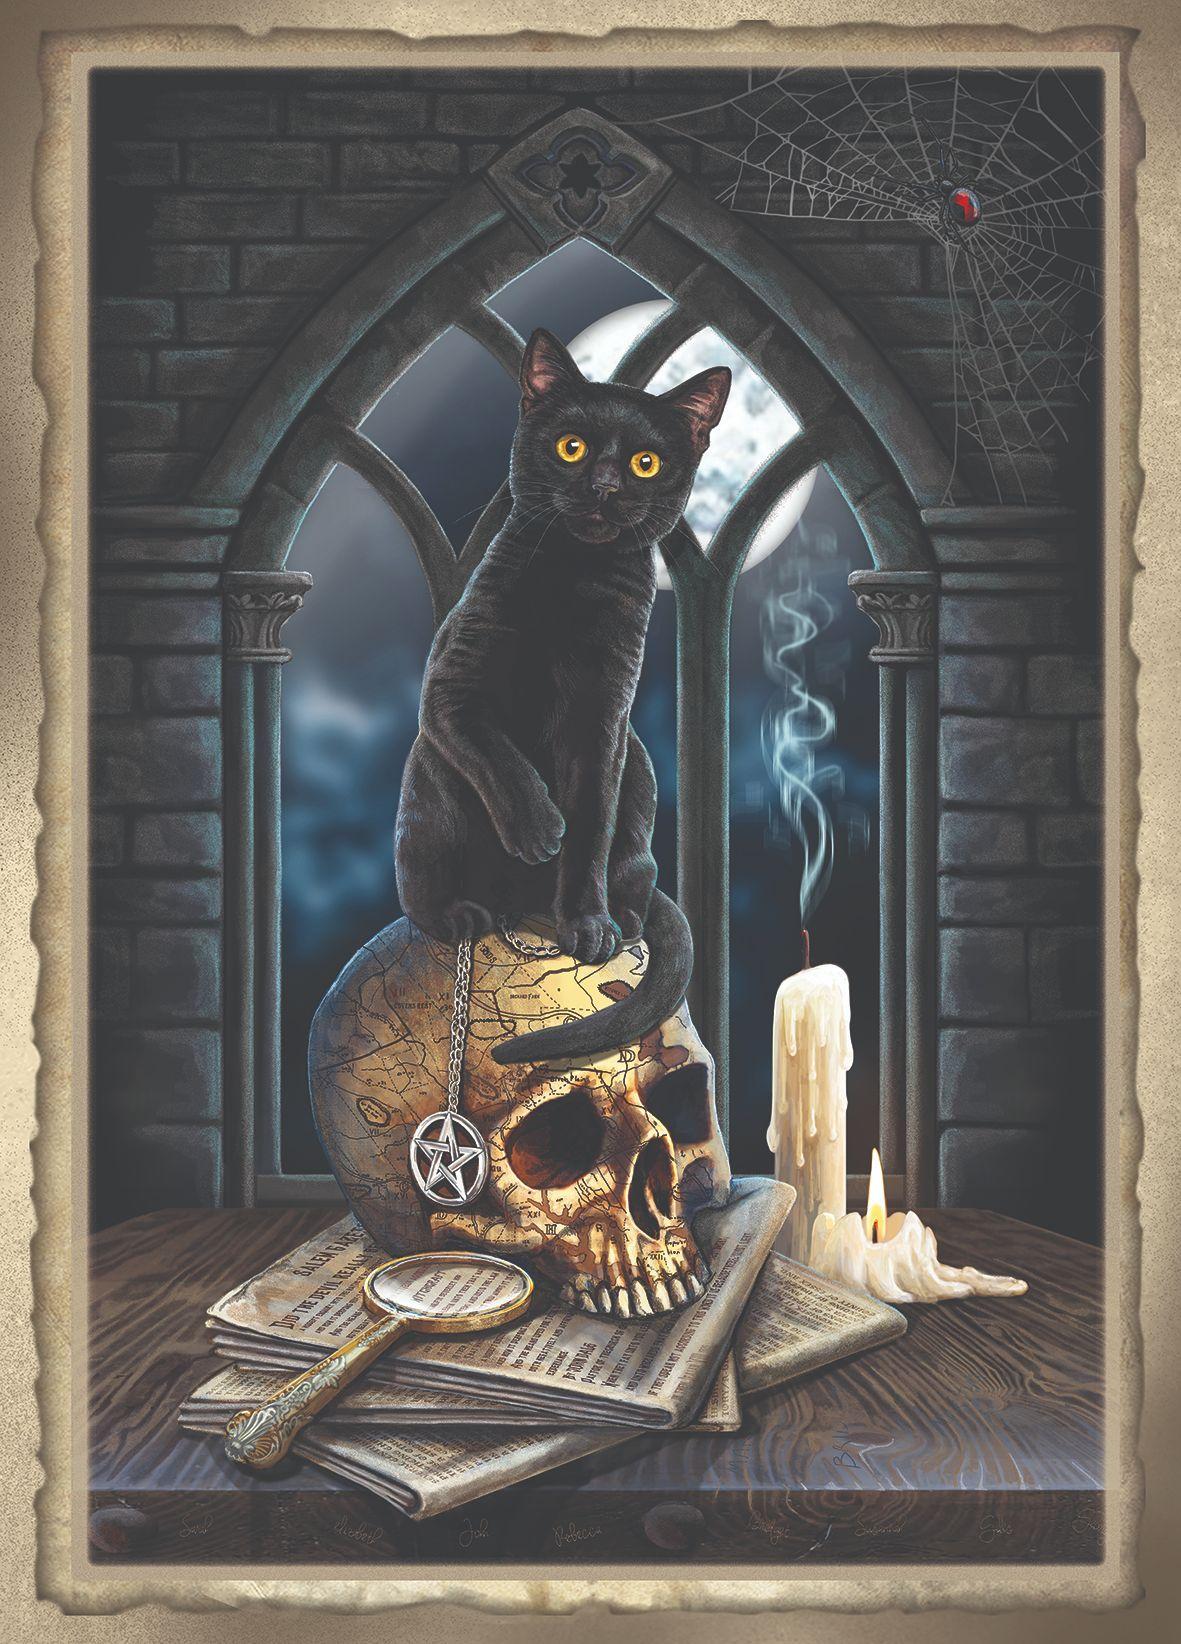 Spirits of Salem A2 print signed by Lisa Parker